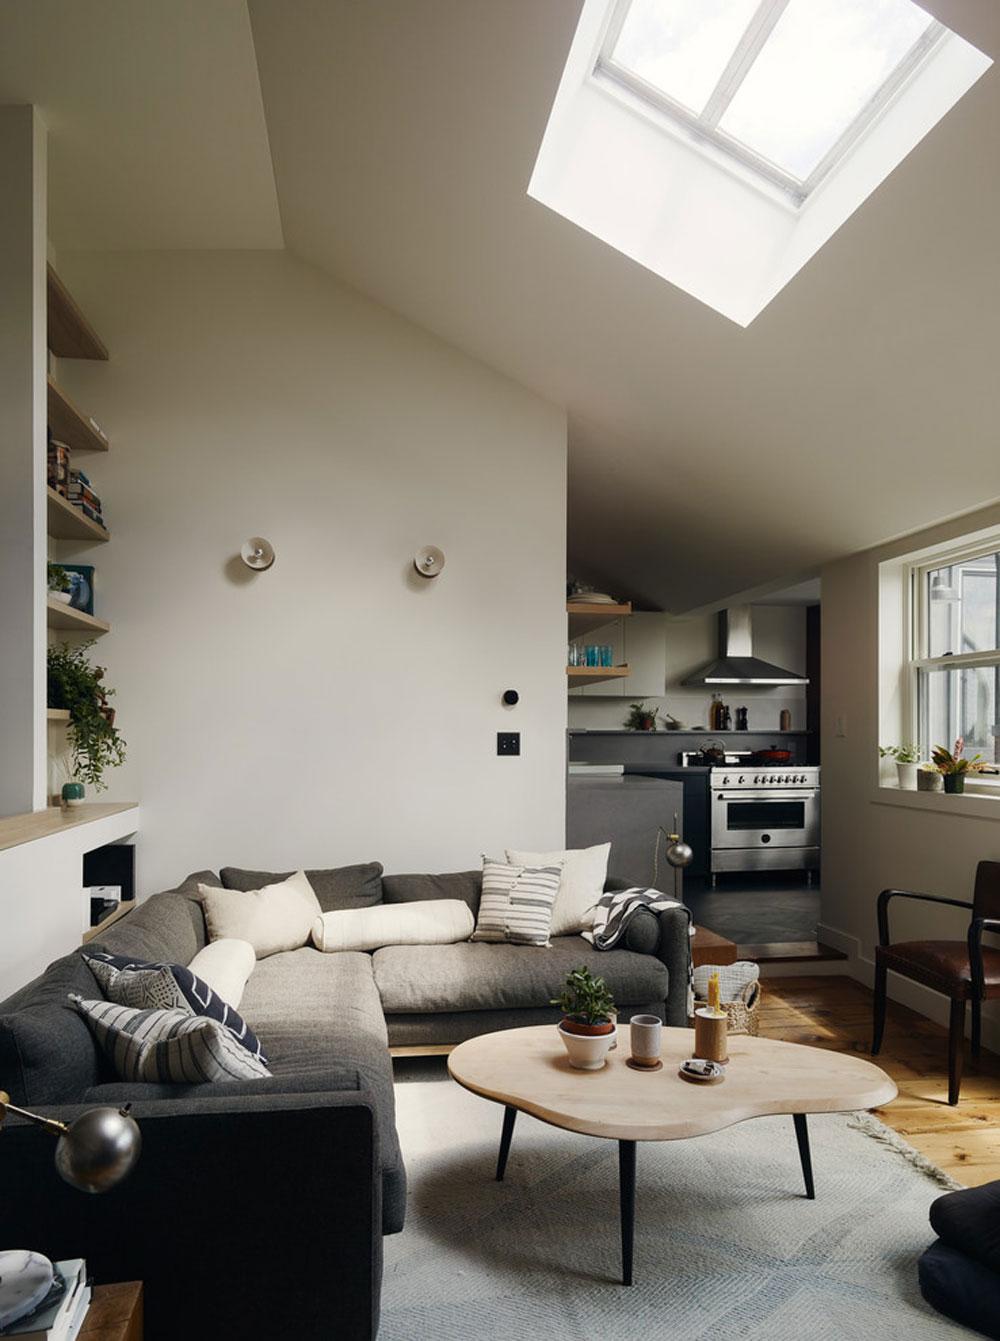 State-Street-by-General-Assembly-1 Liten lägenhet vardagsrum idéer på en budget